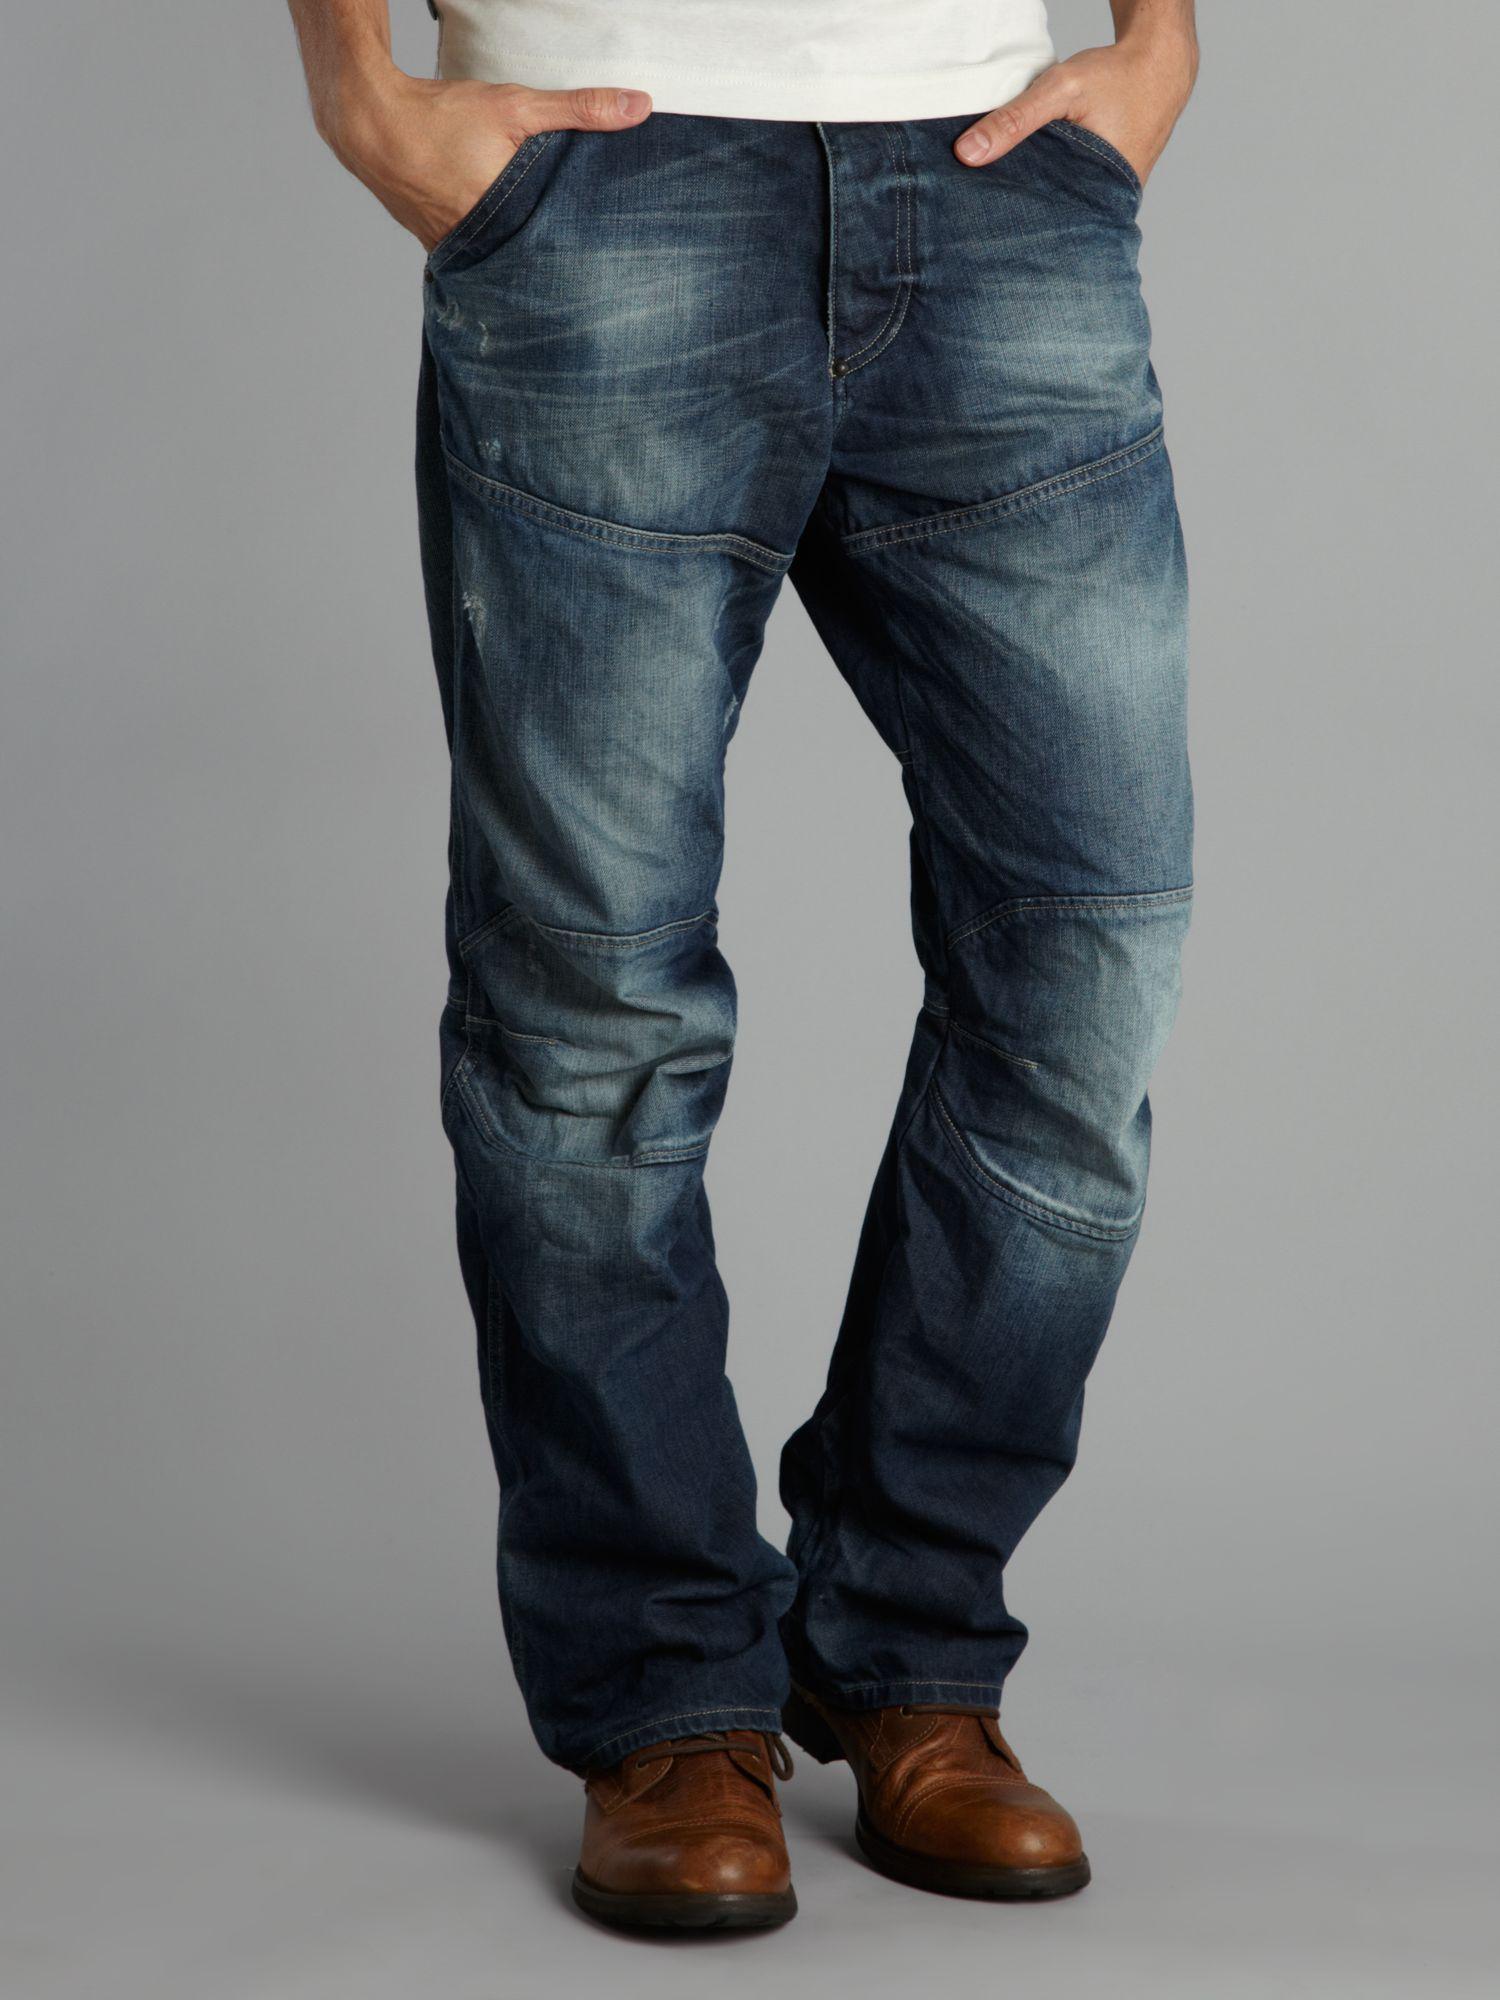 lyst g star raw loose 3d jeans in blue for men. Black Bedroom Furniture Sets. Home Design Ideas